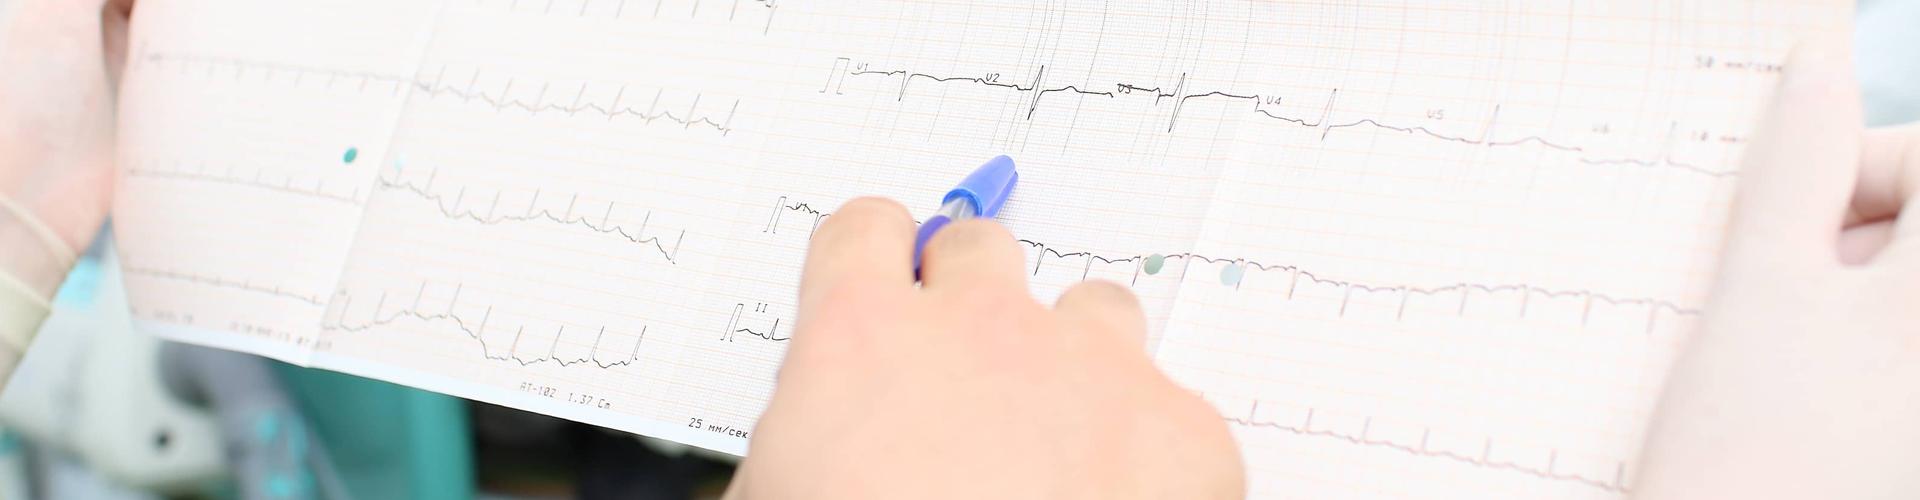 interpretive cardiogram of patient in hospital